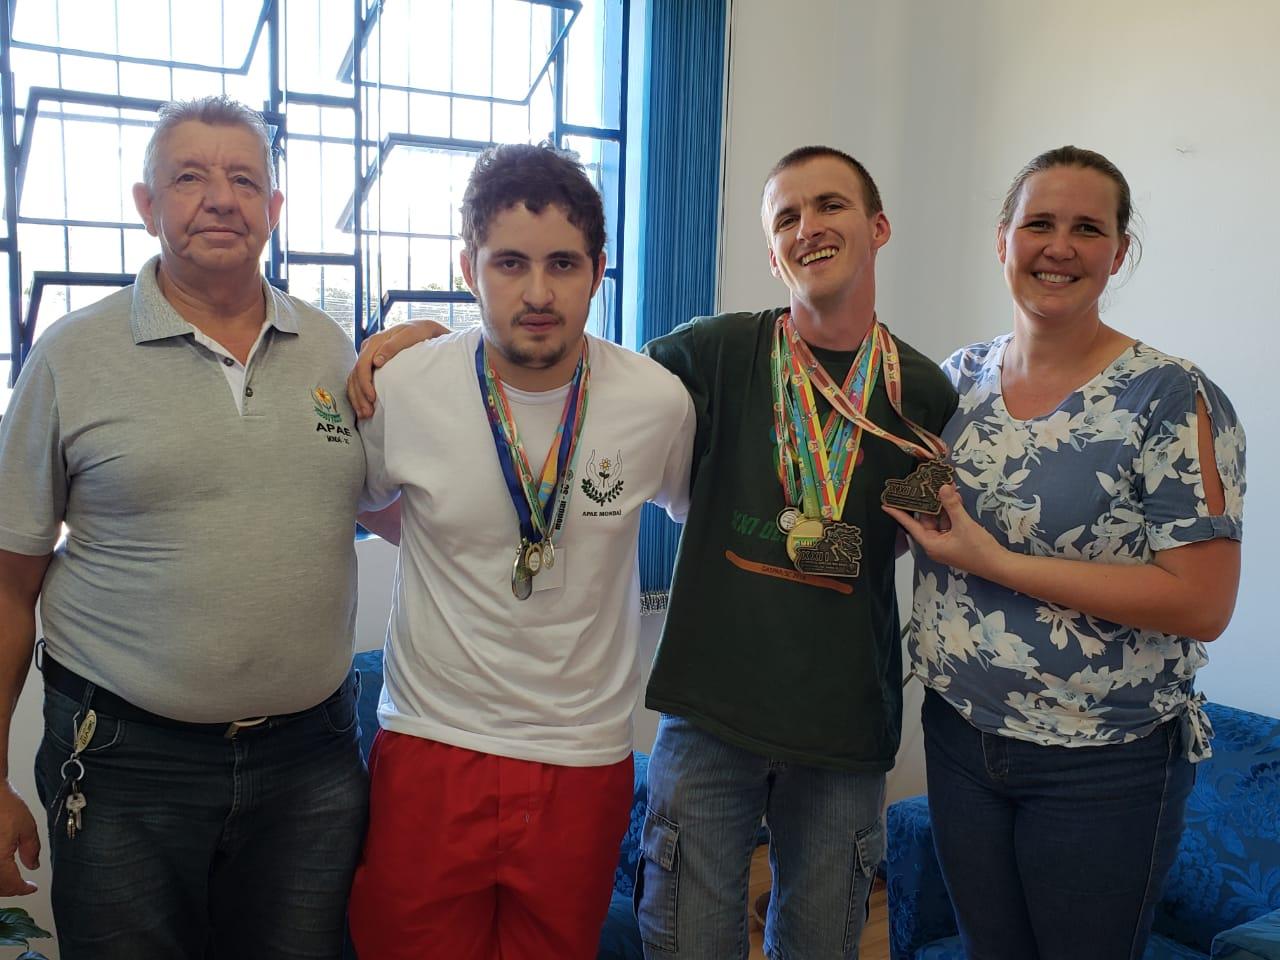 Aluno da APAE de Mondaí conquista 3º lugar no atletismo das olimpíadas nacionais